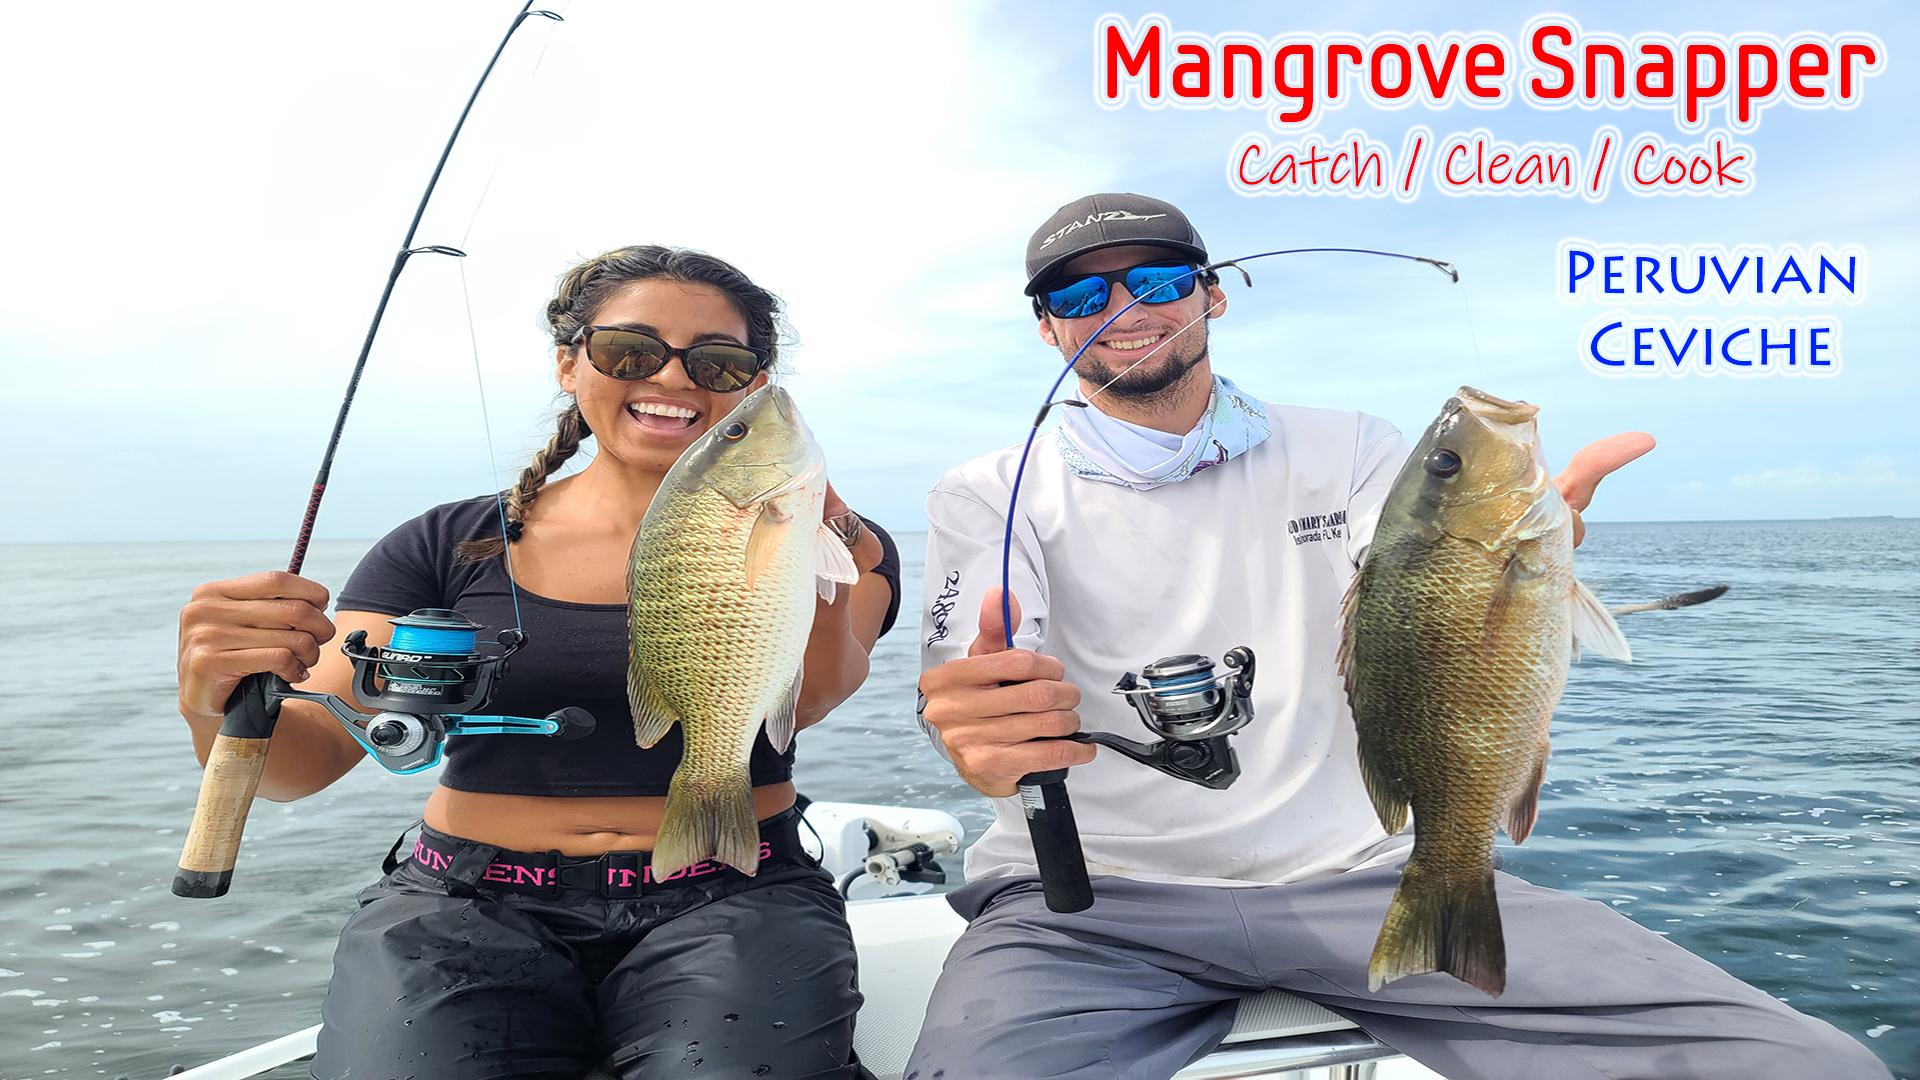 Mangrove Snapper Ceviche!